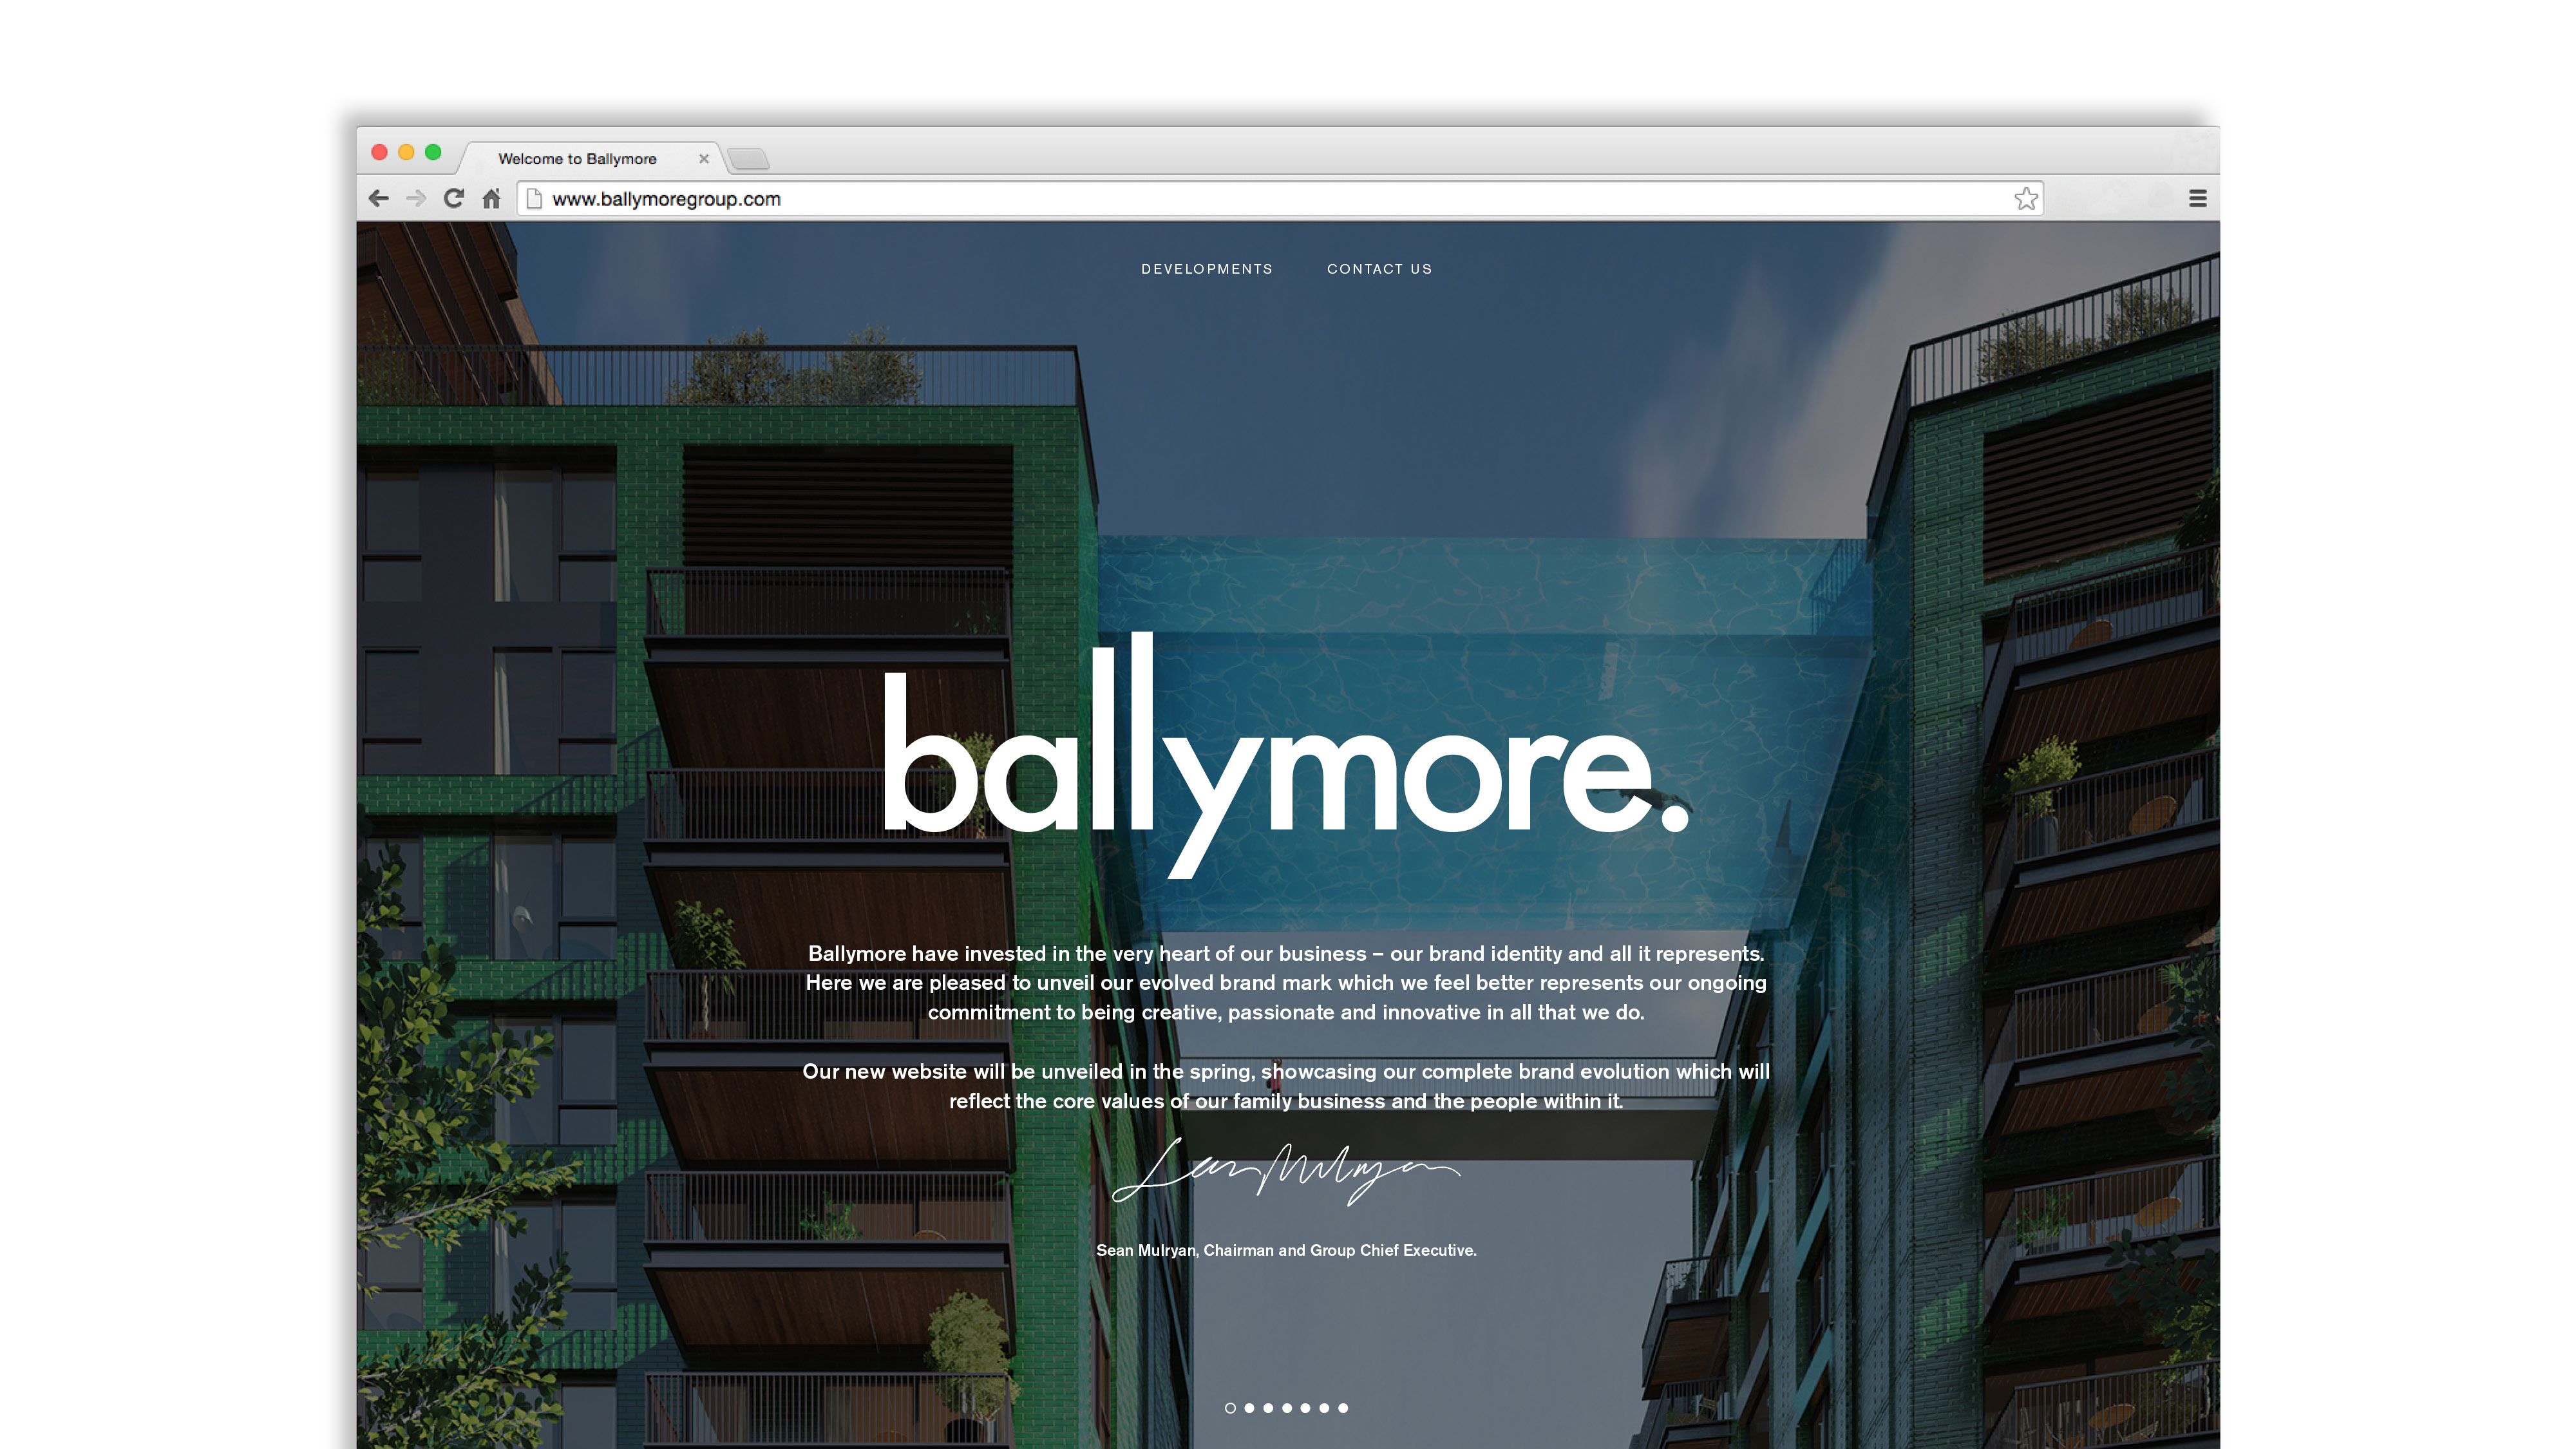 Ballymore_Rebrand_WebHoldingPage160112LR2_22